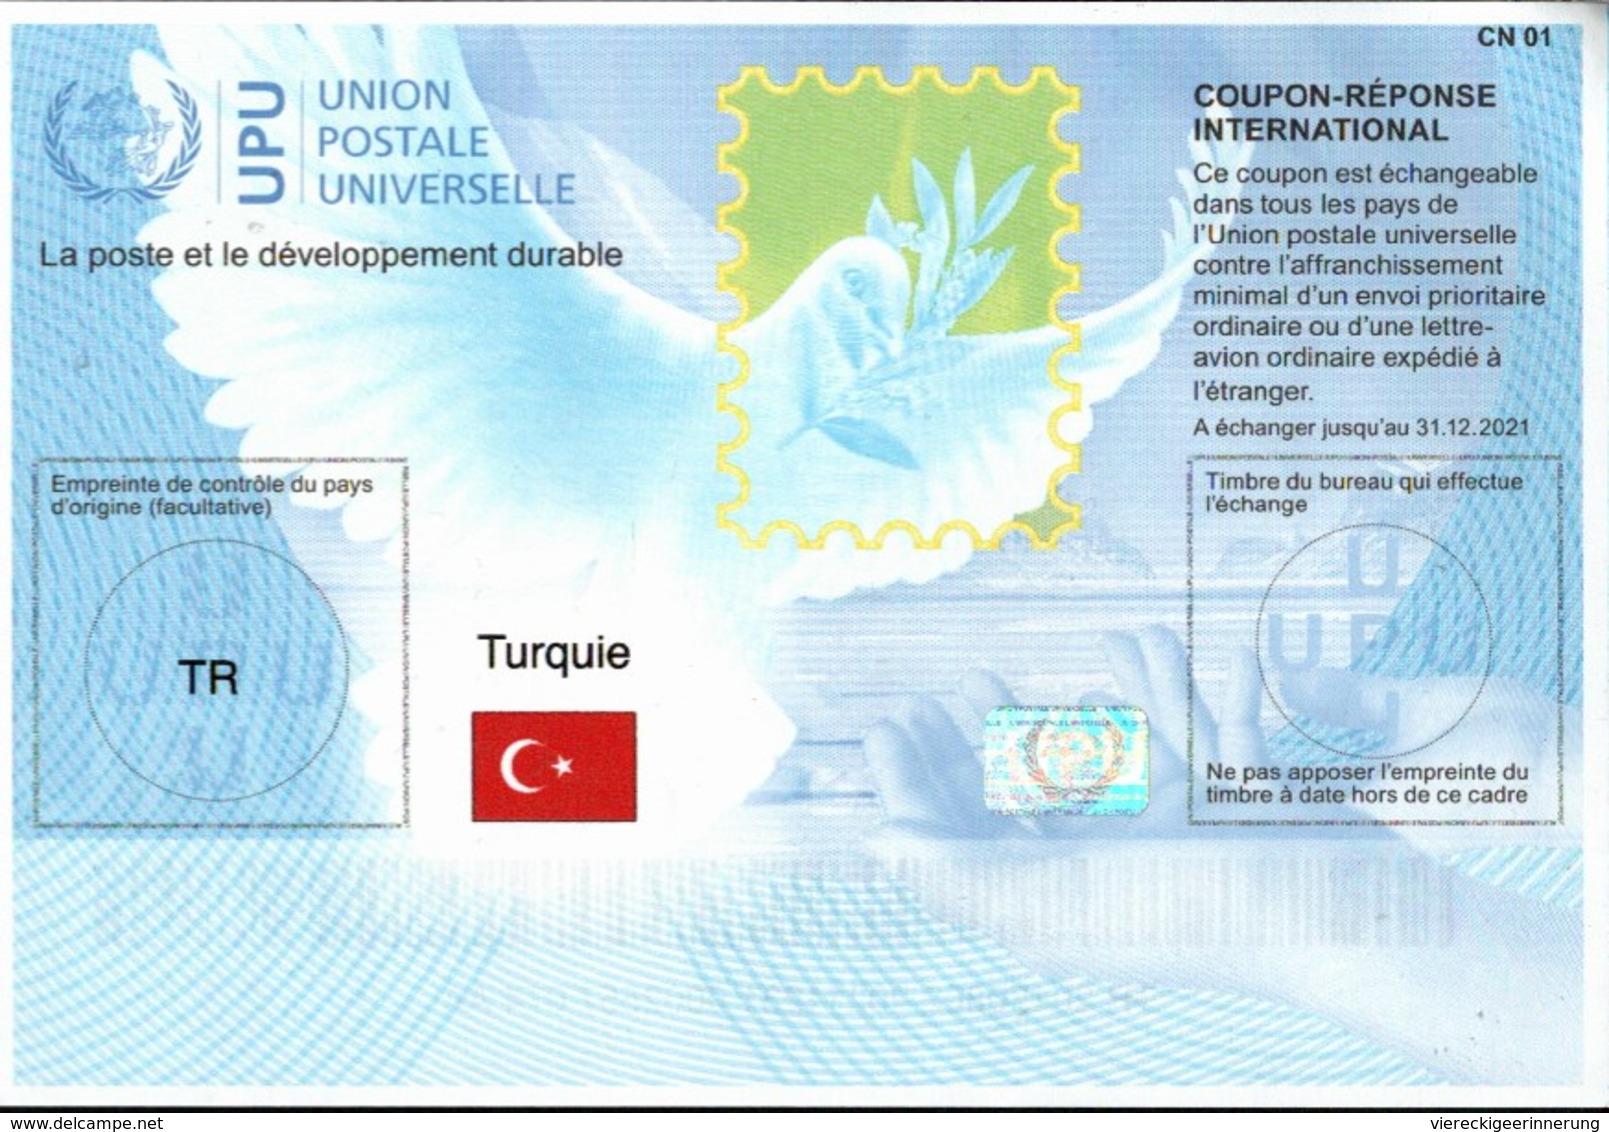 ! New International Reply Coupons, Coupon Reponse, Internationale Antwortscheine, UPU, Weltpostverein - Nuevos